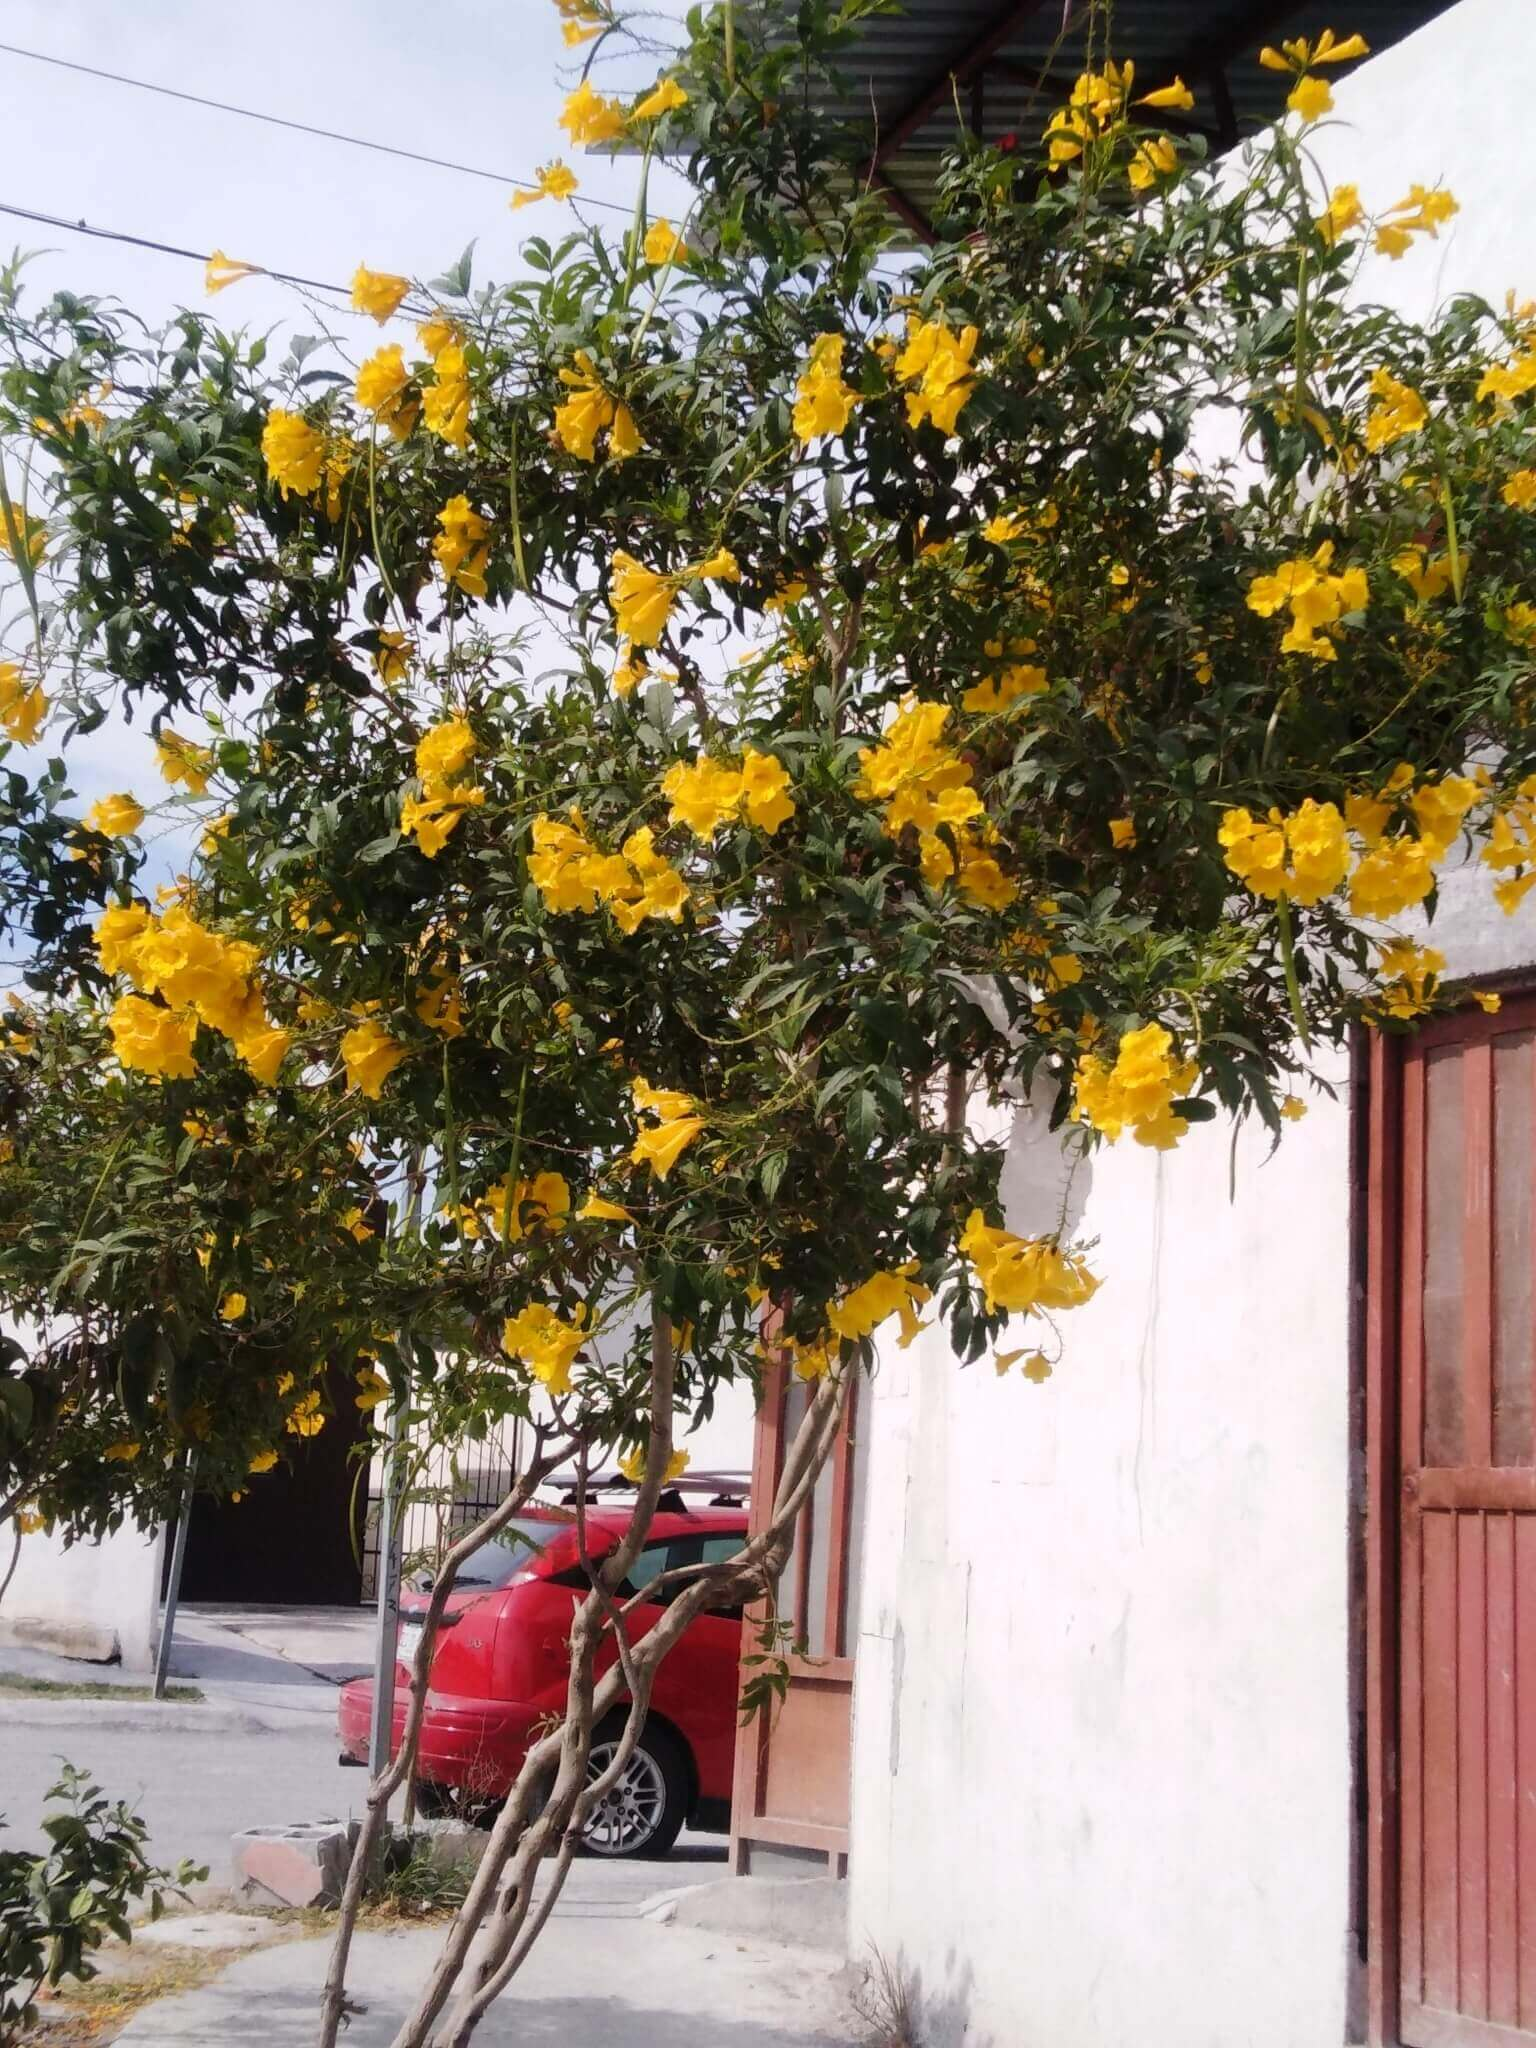 Tecoma stans Yellow elder